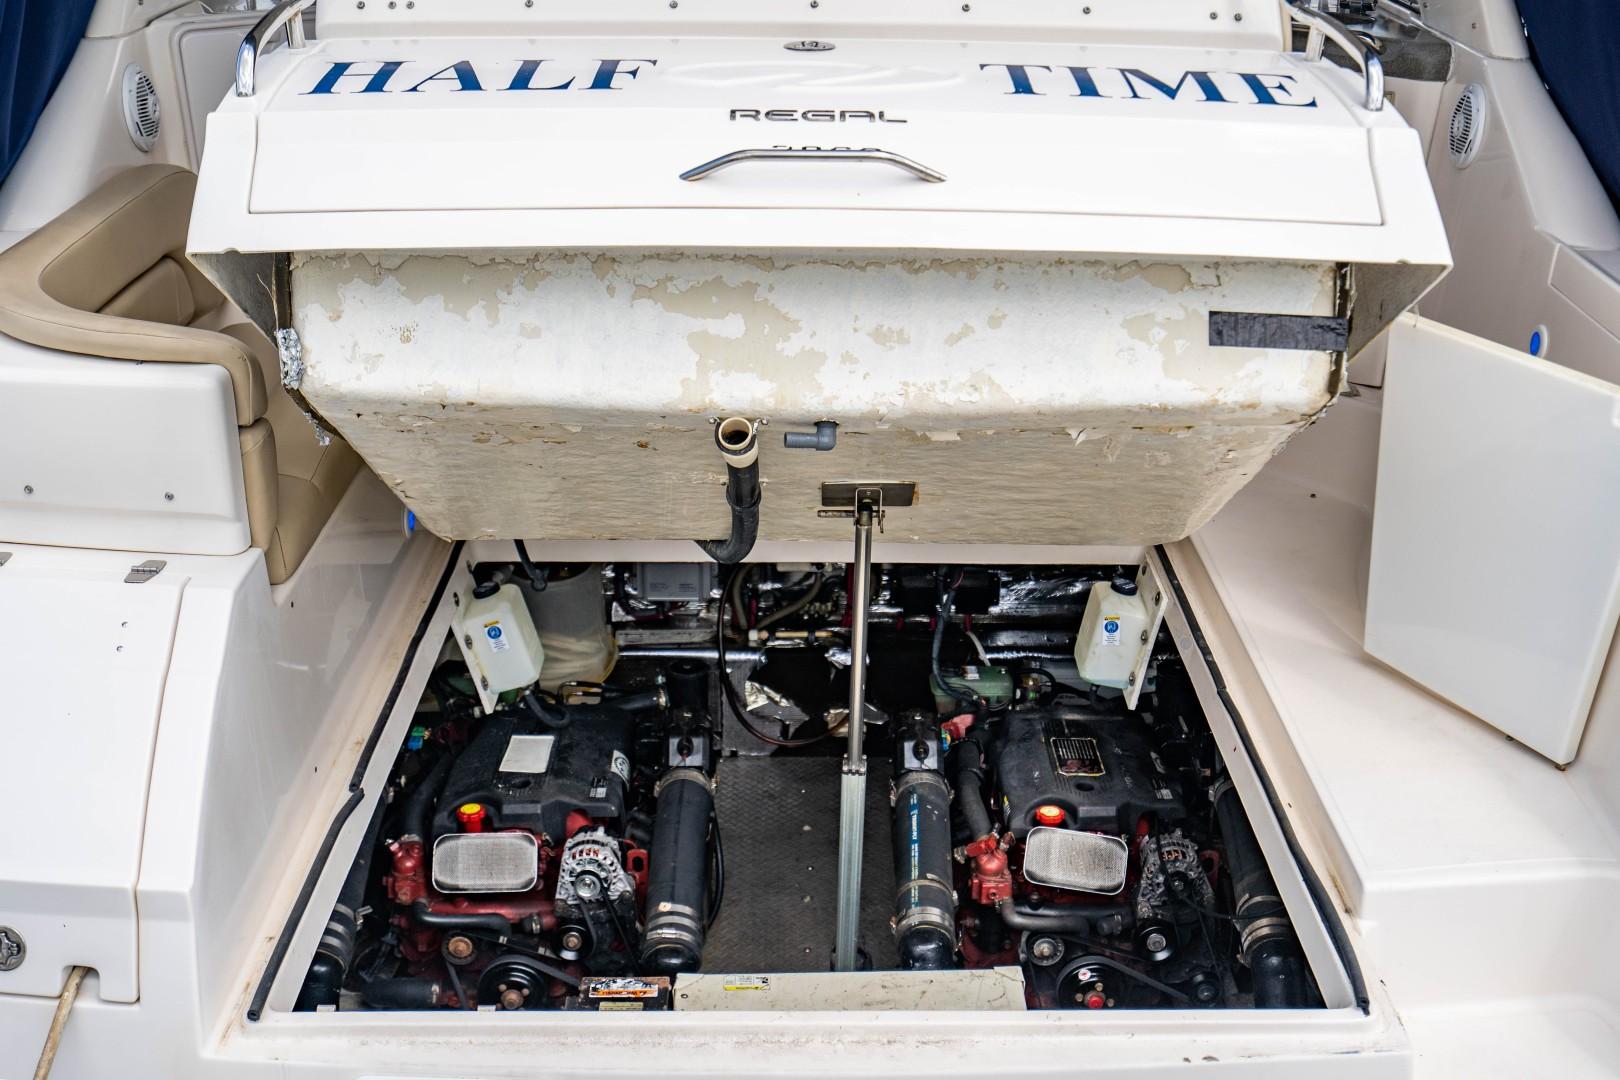 Regal 38 - Half Time - Engine Access